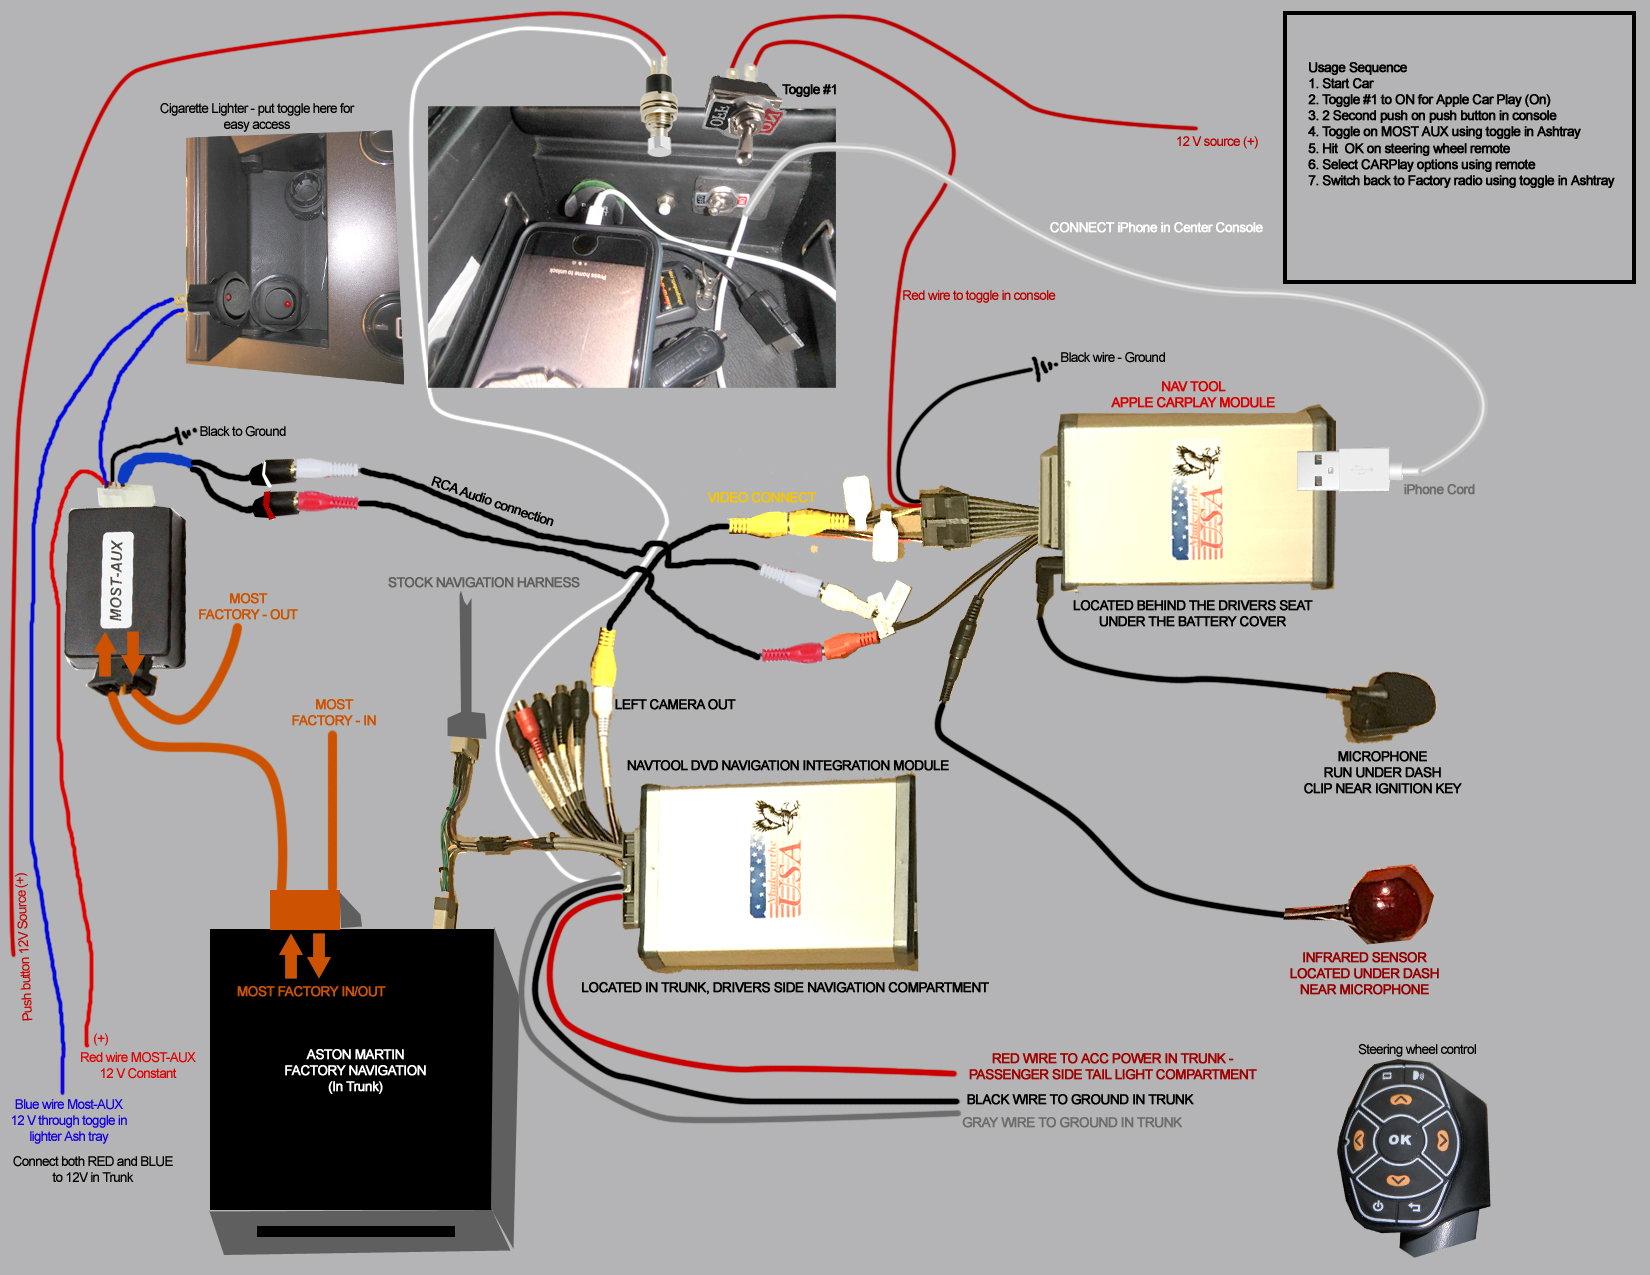 aston martin vantage wiring diagram wiring diagram schematics Electrical Wiring Diagrams Symbols Chart